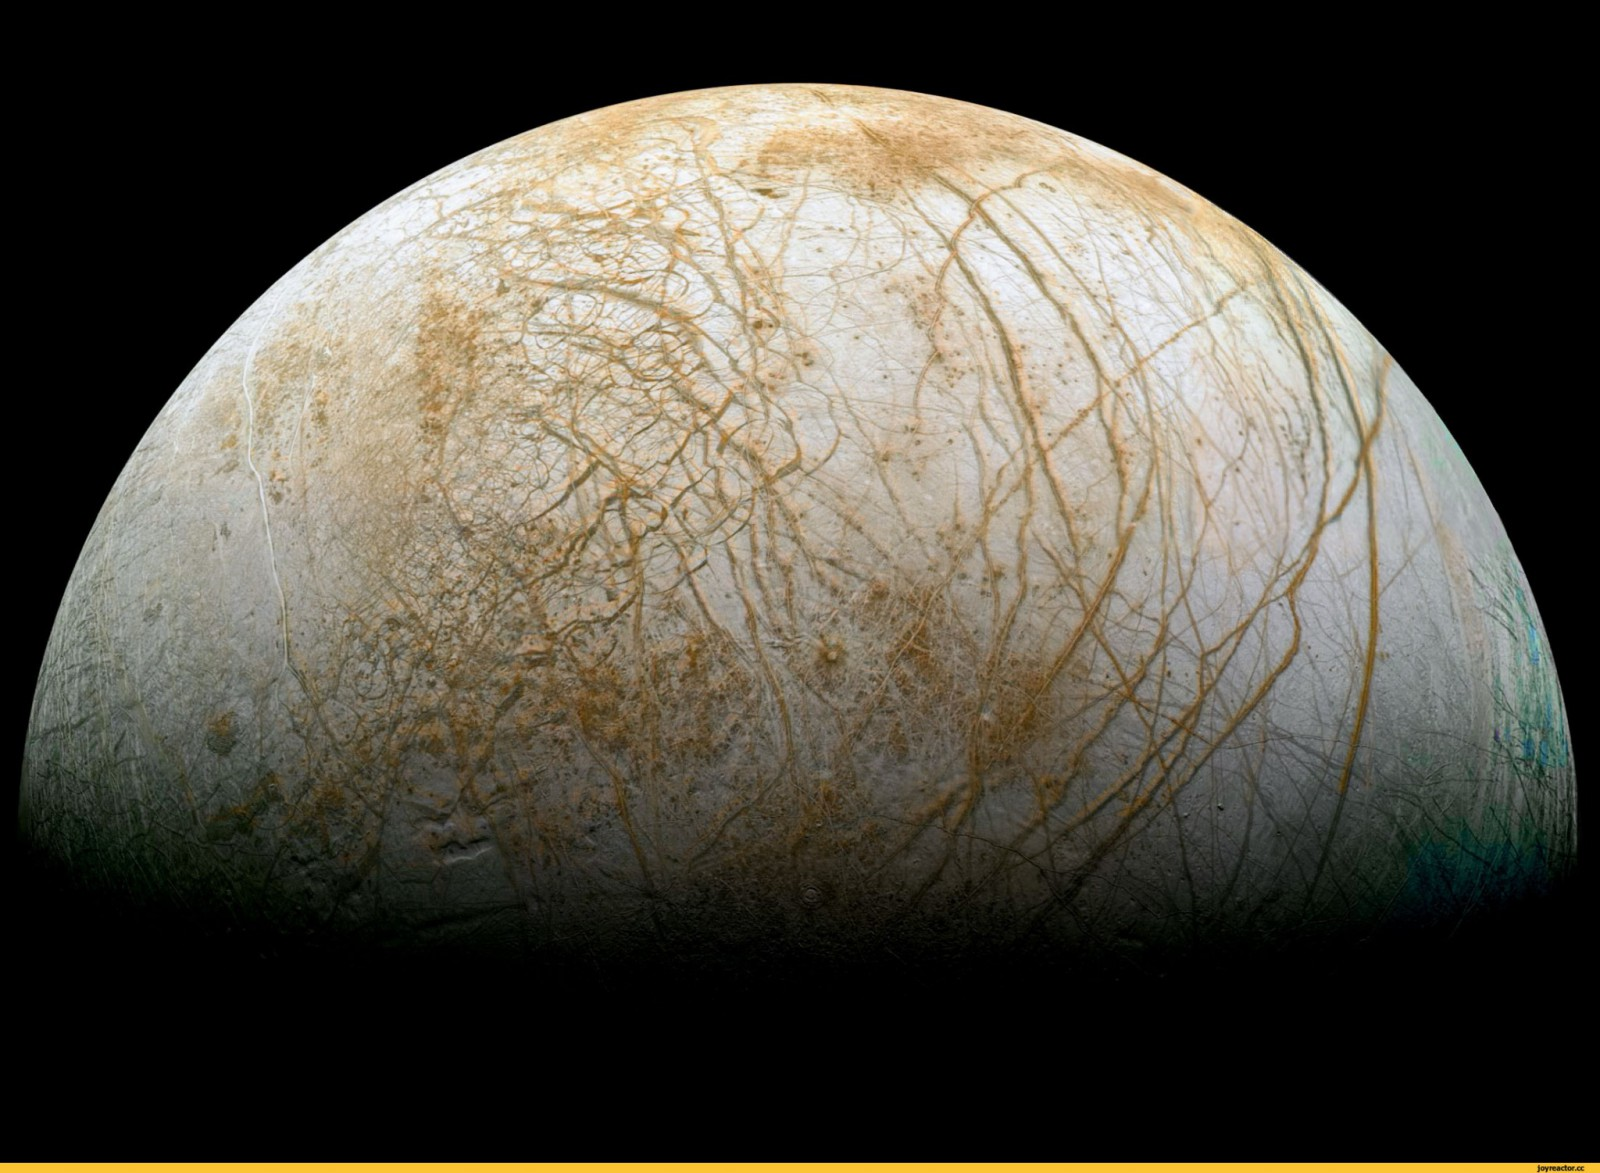 Снимок Луны Юпитера / Фото дня